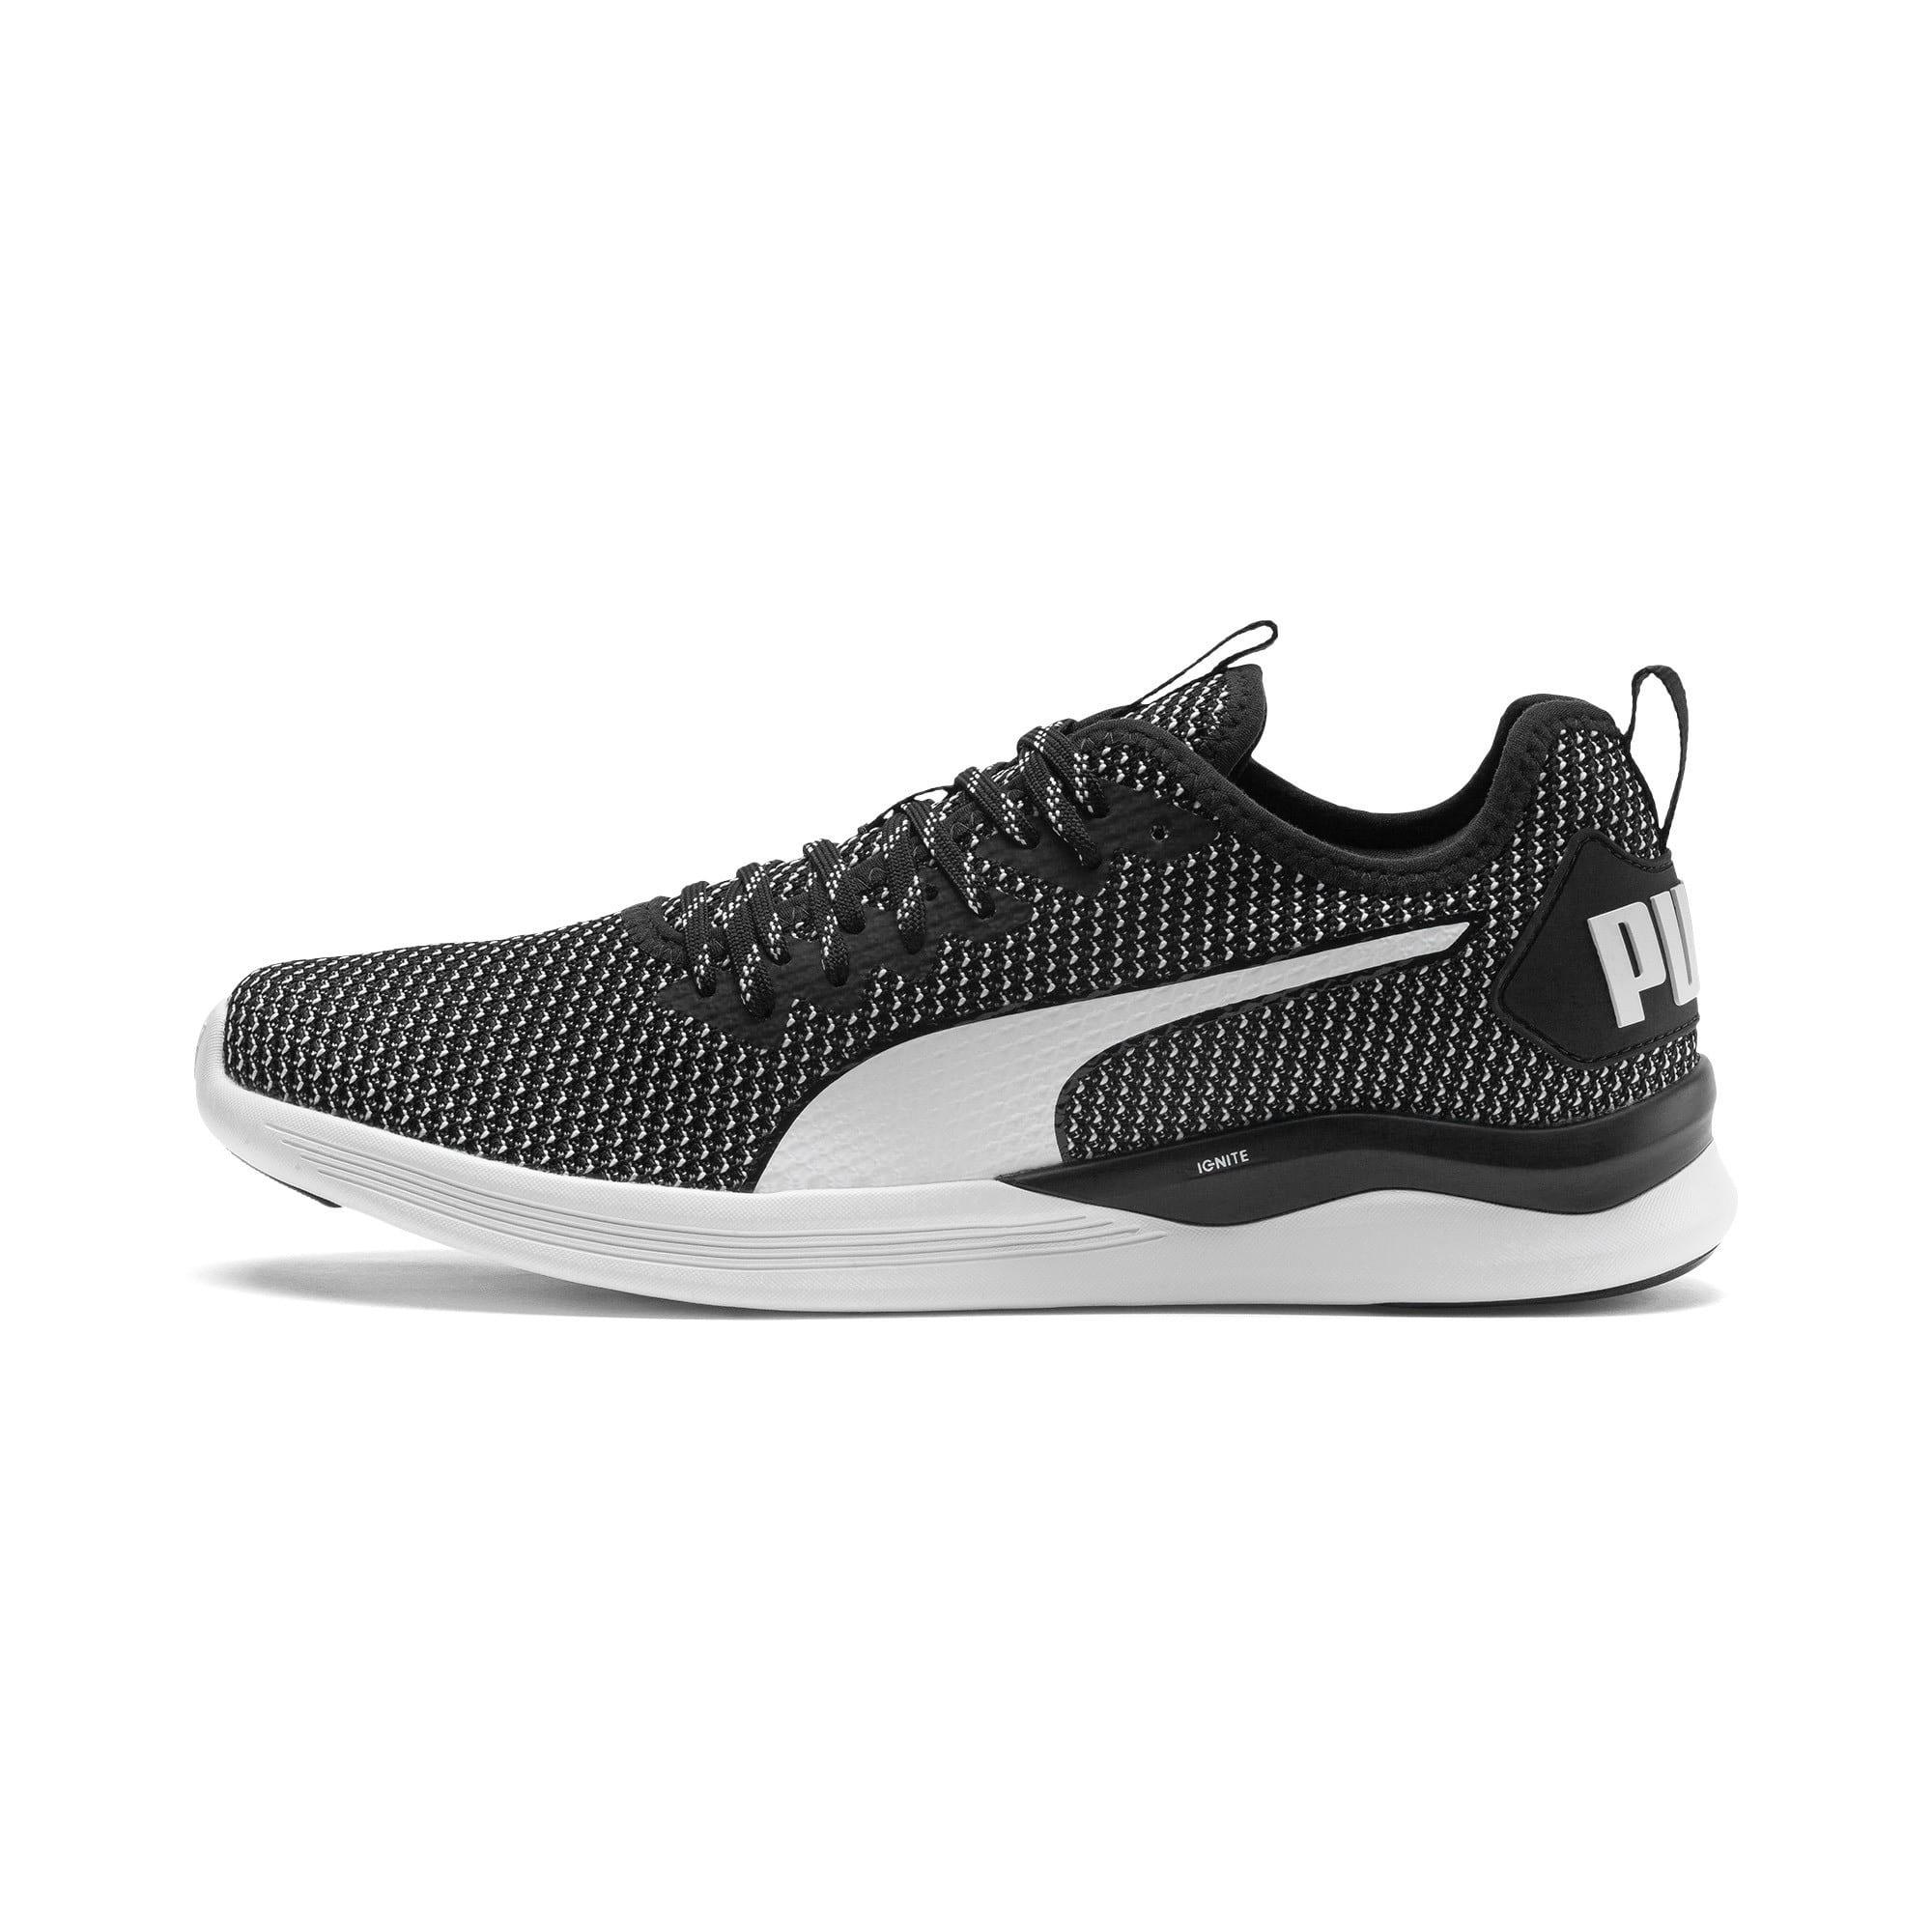 Thumbnail 1 of IGNITE Flash FS Men's Running Shoes, Puma Black-Puma White, medium